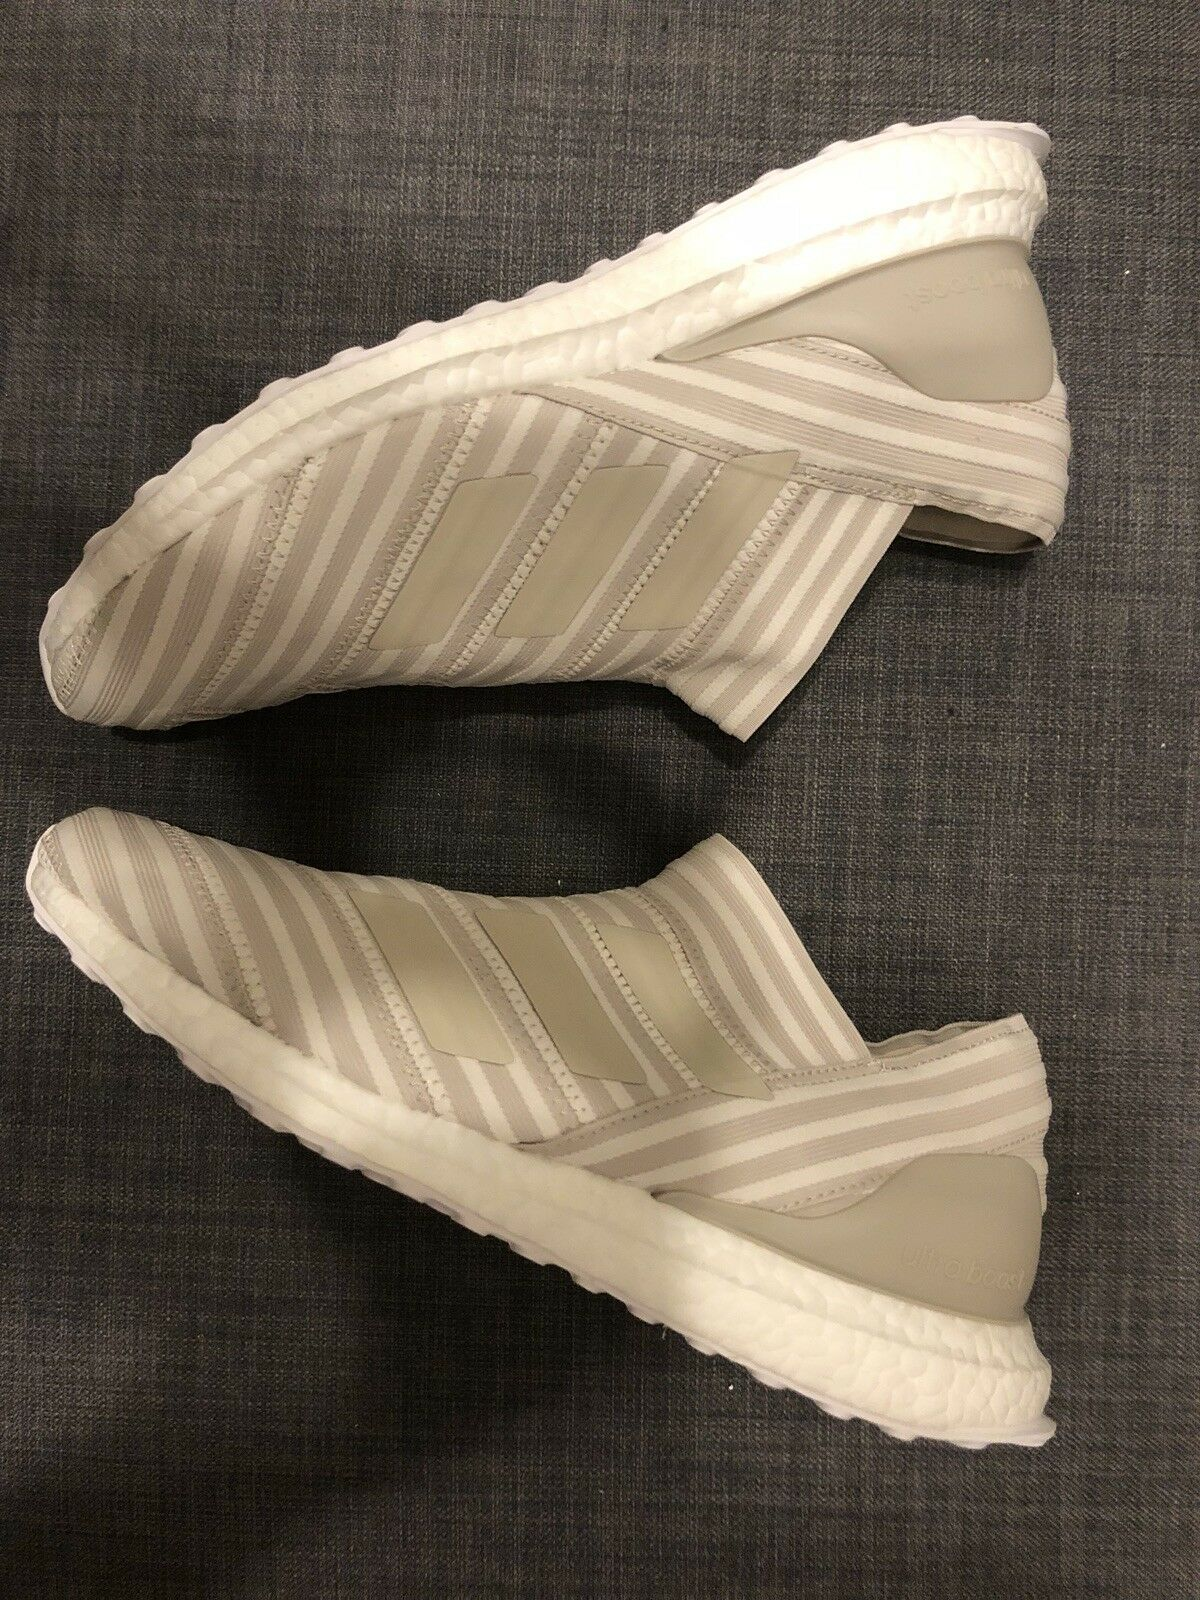 Adidas 360 - schub nmd hu nemeziz tango 17 + 360 Adidas agilität ultraboost cg3660 10,5 81775a